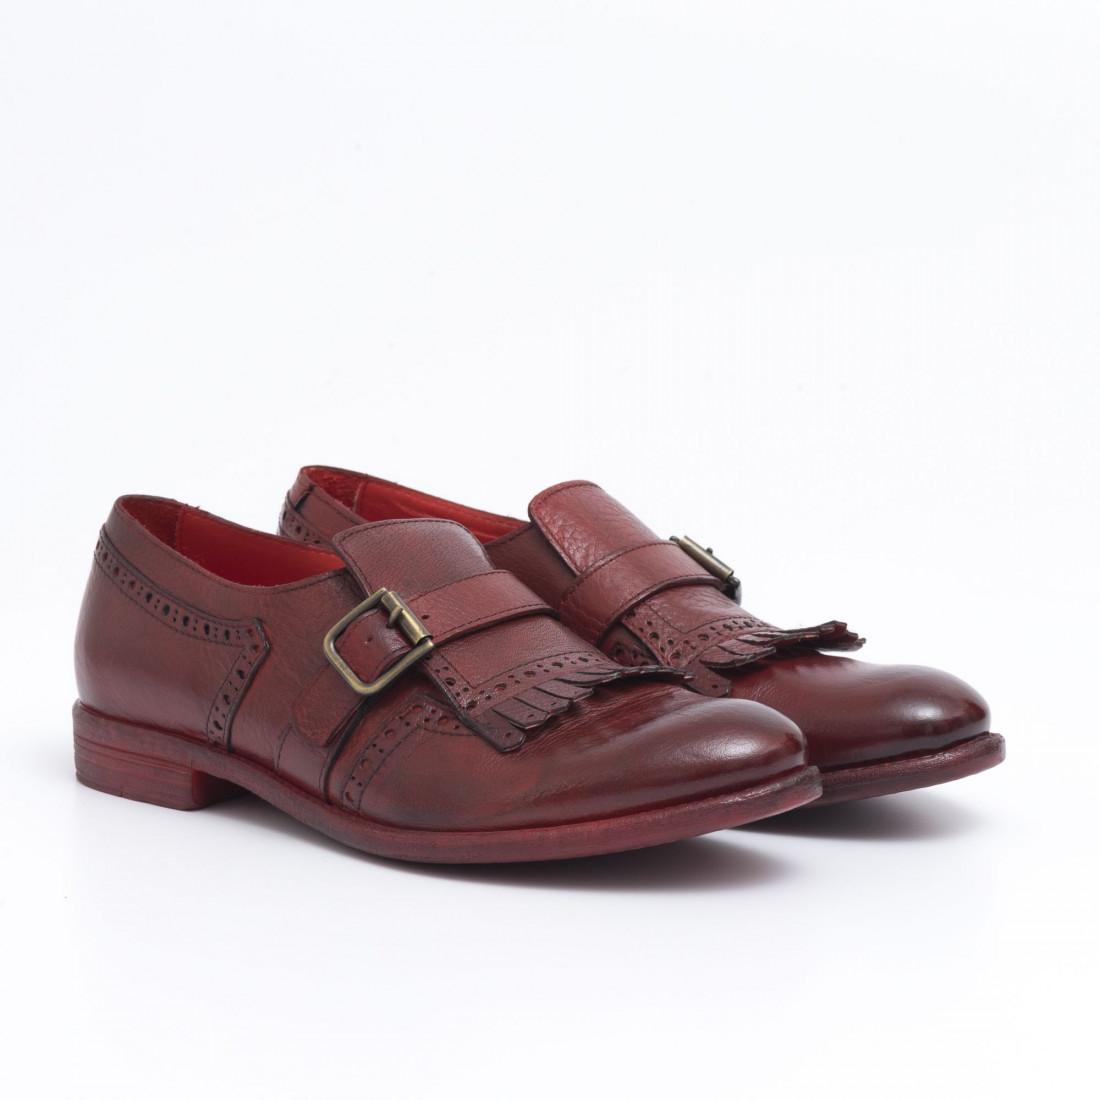 slip on woman hundred w246 08 bufalo rosso 485